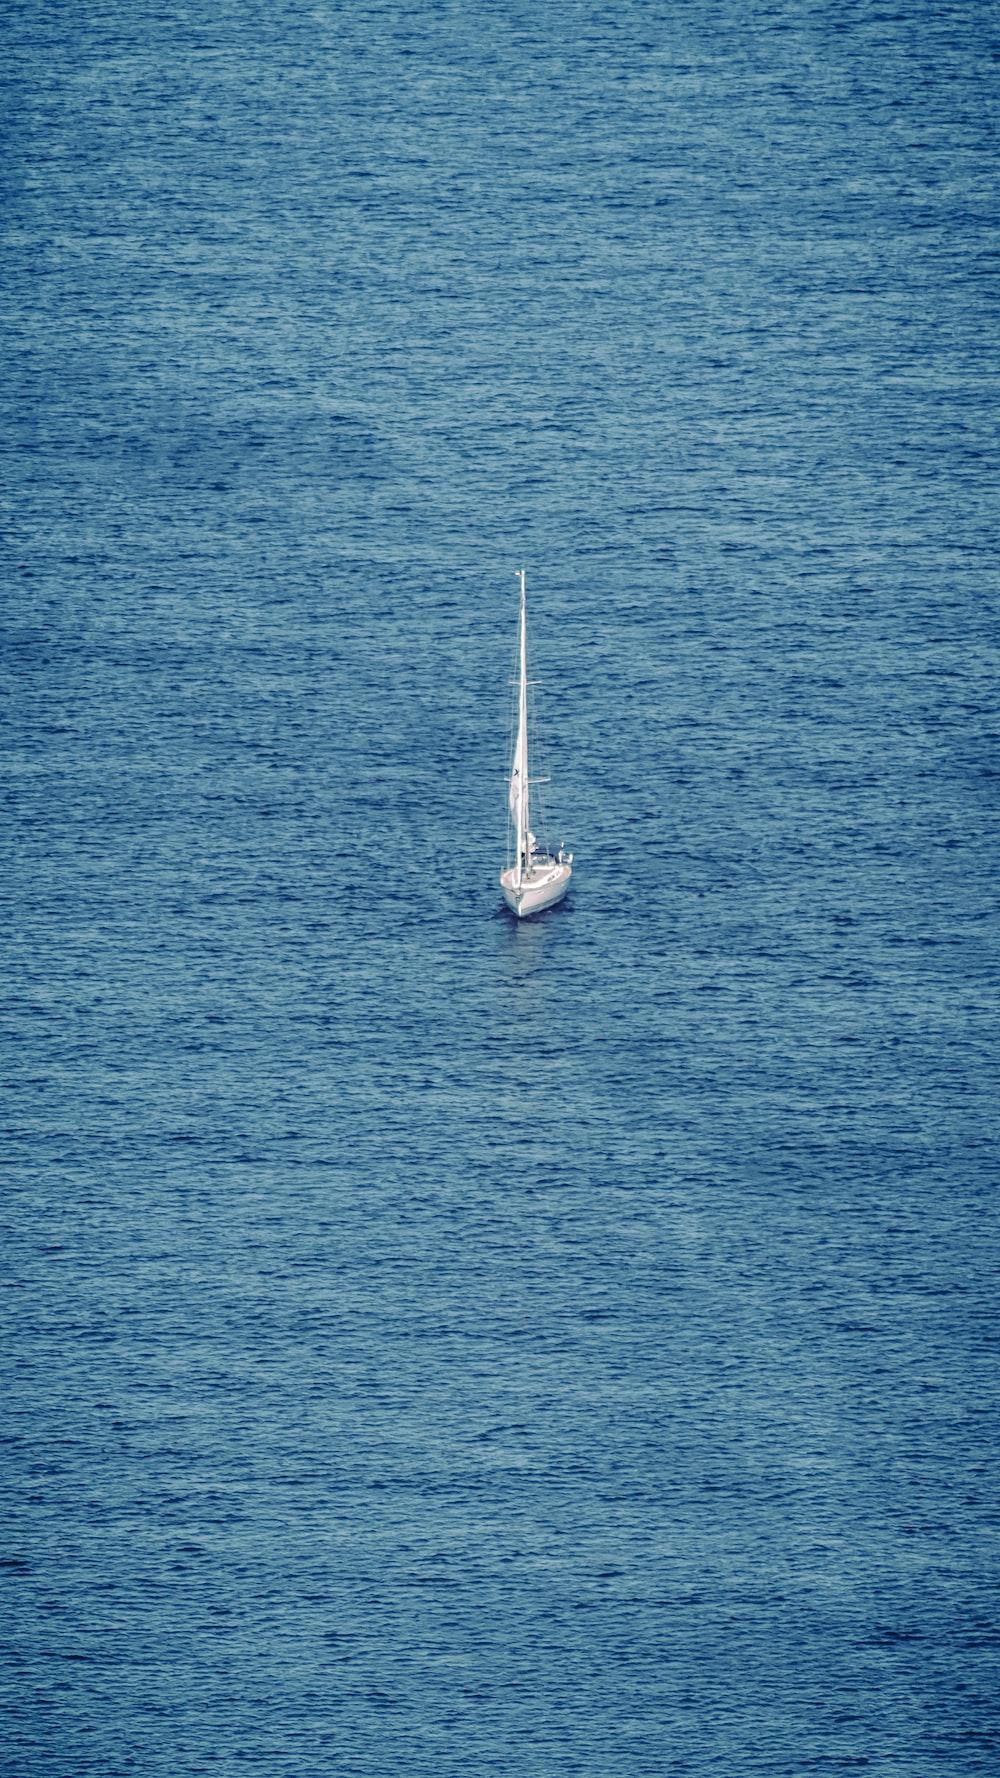 white sailboat on blue sea during daytime